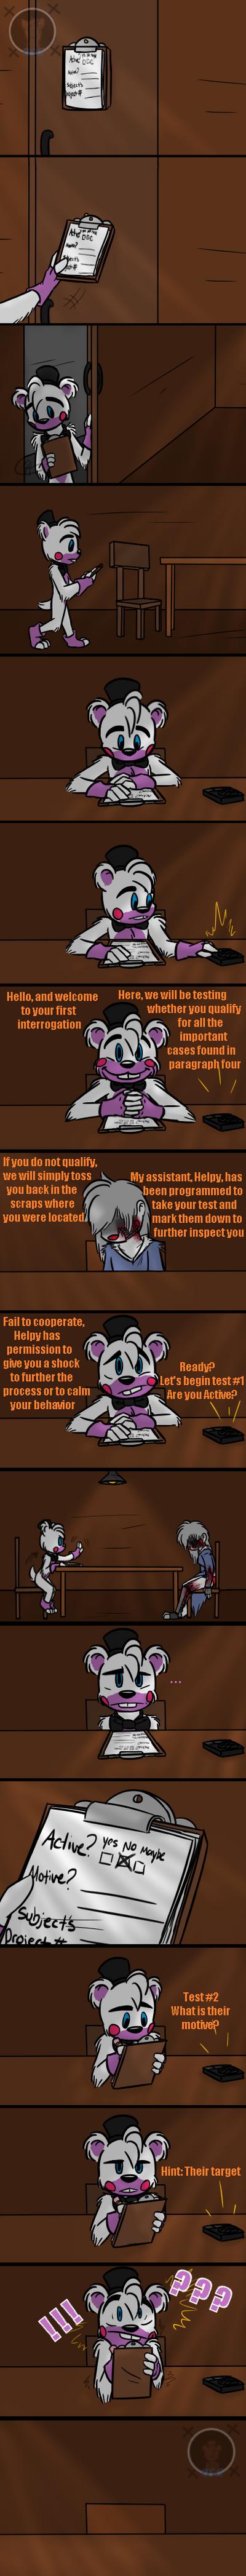 Swift Call (FNAF 6 Comic) Pt.1 by Blustreakgirl